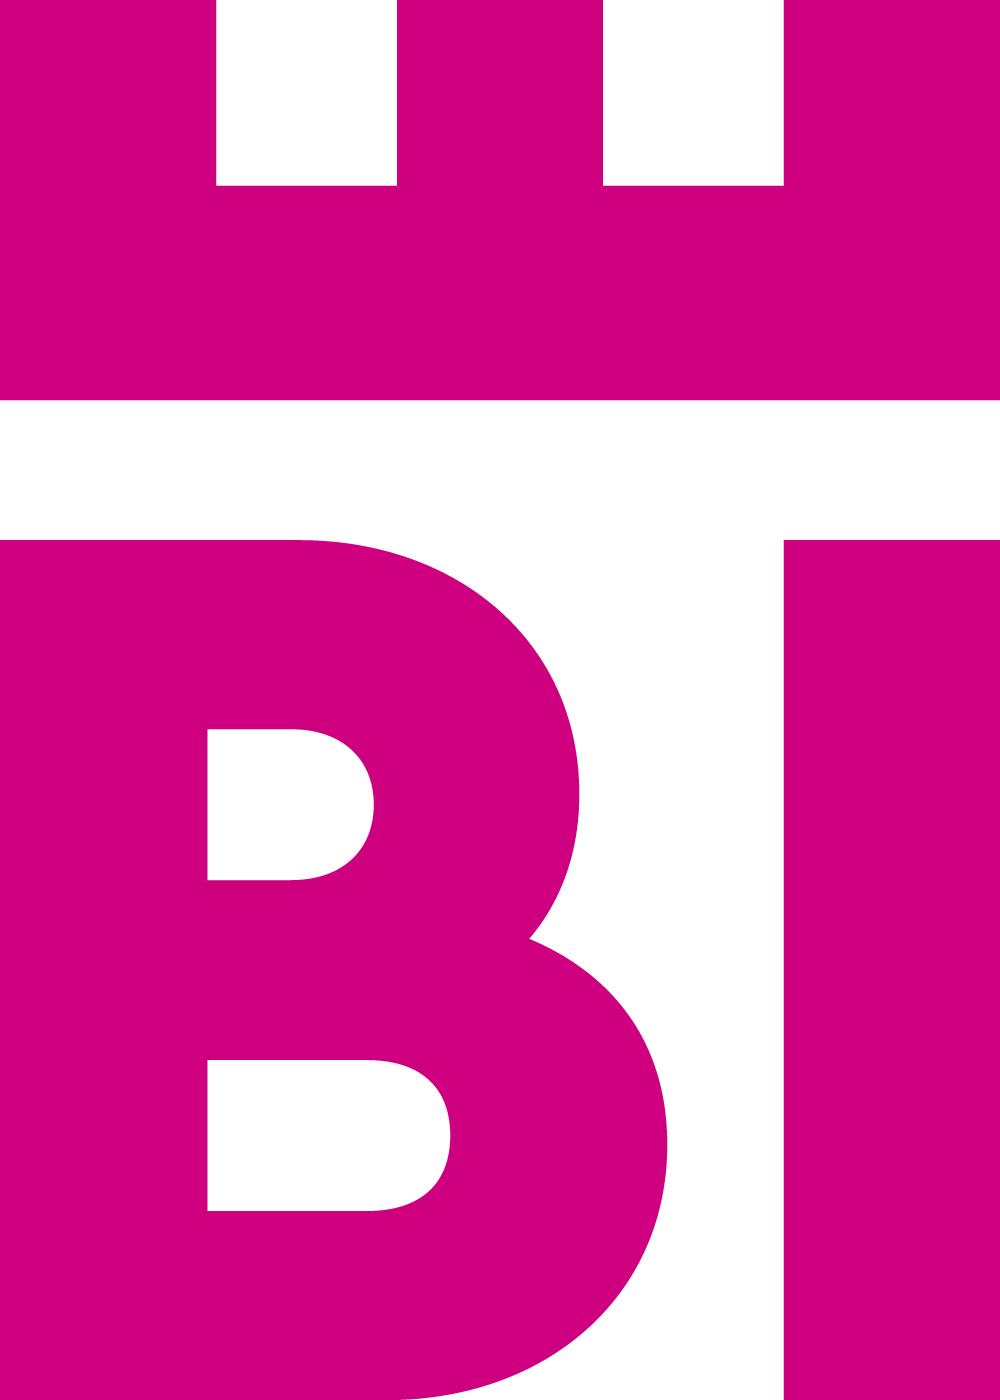 Logovariante pink